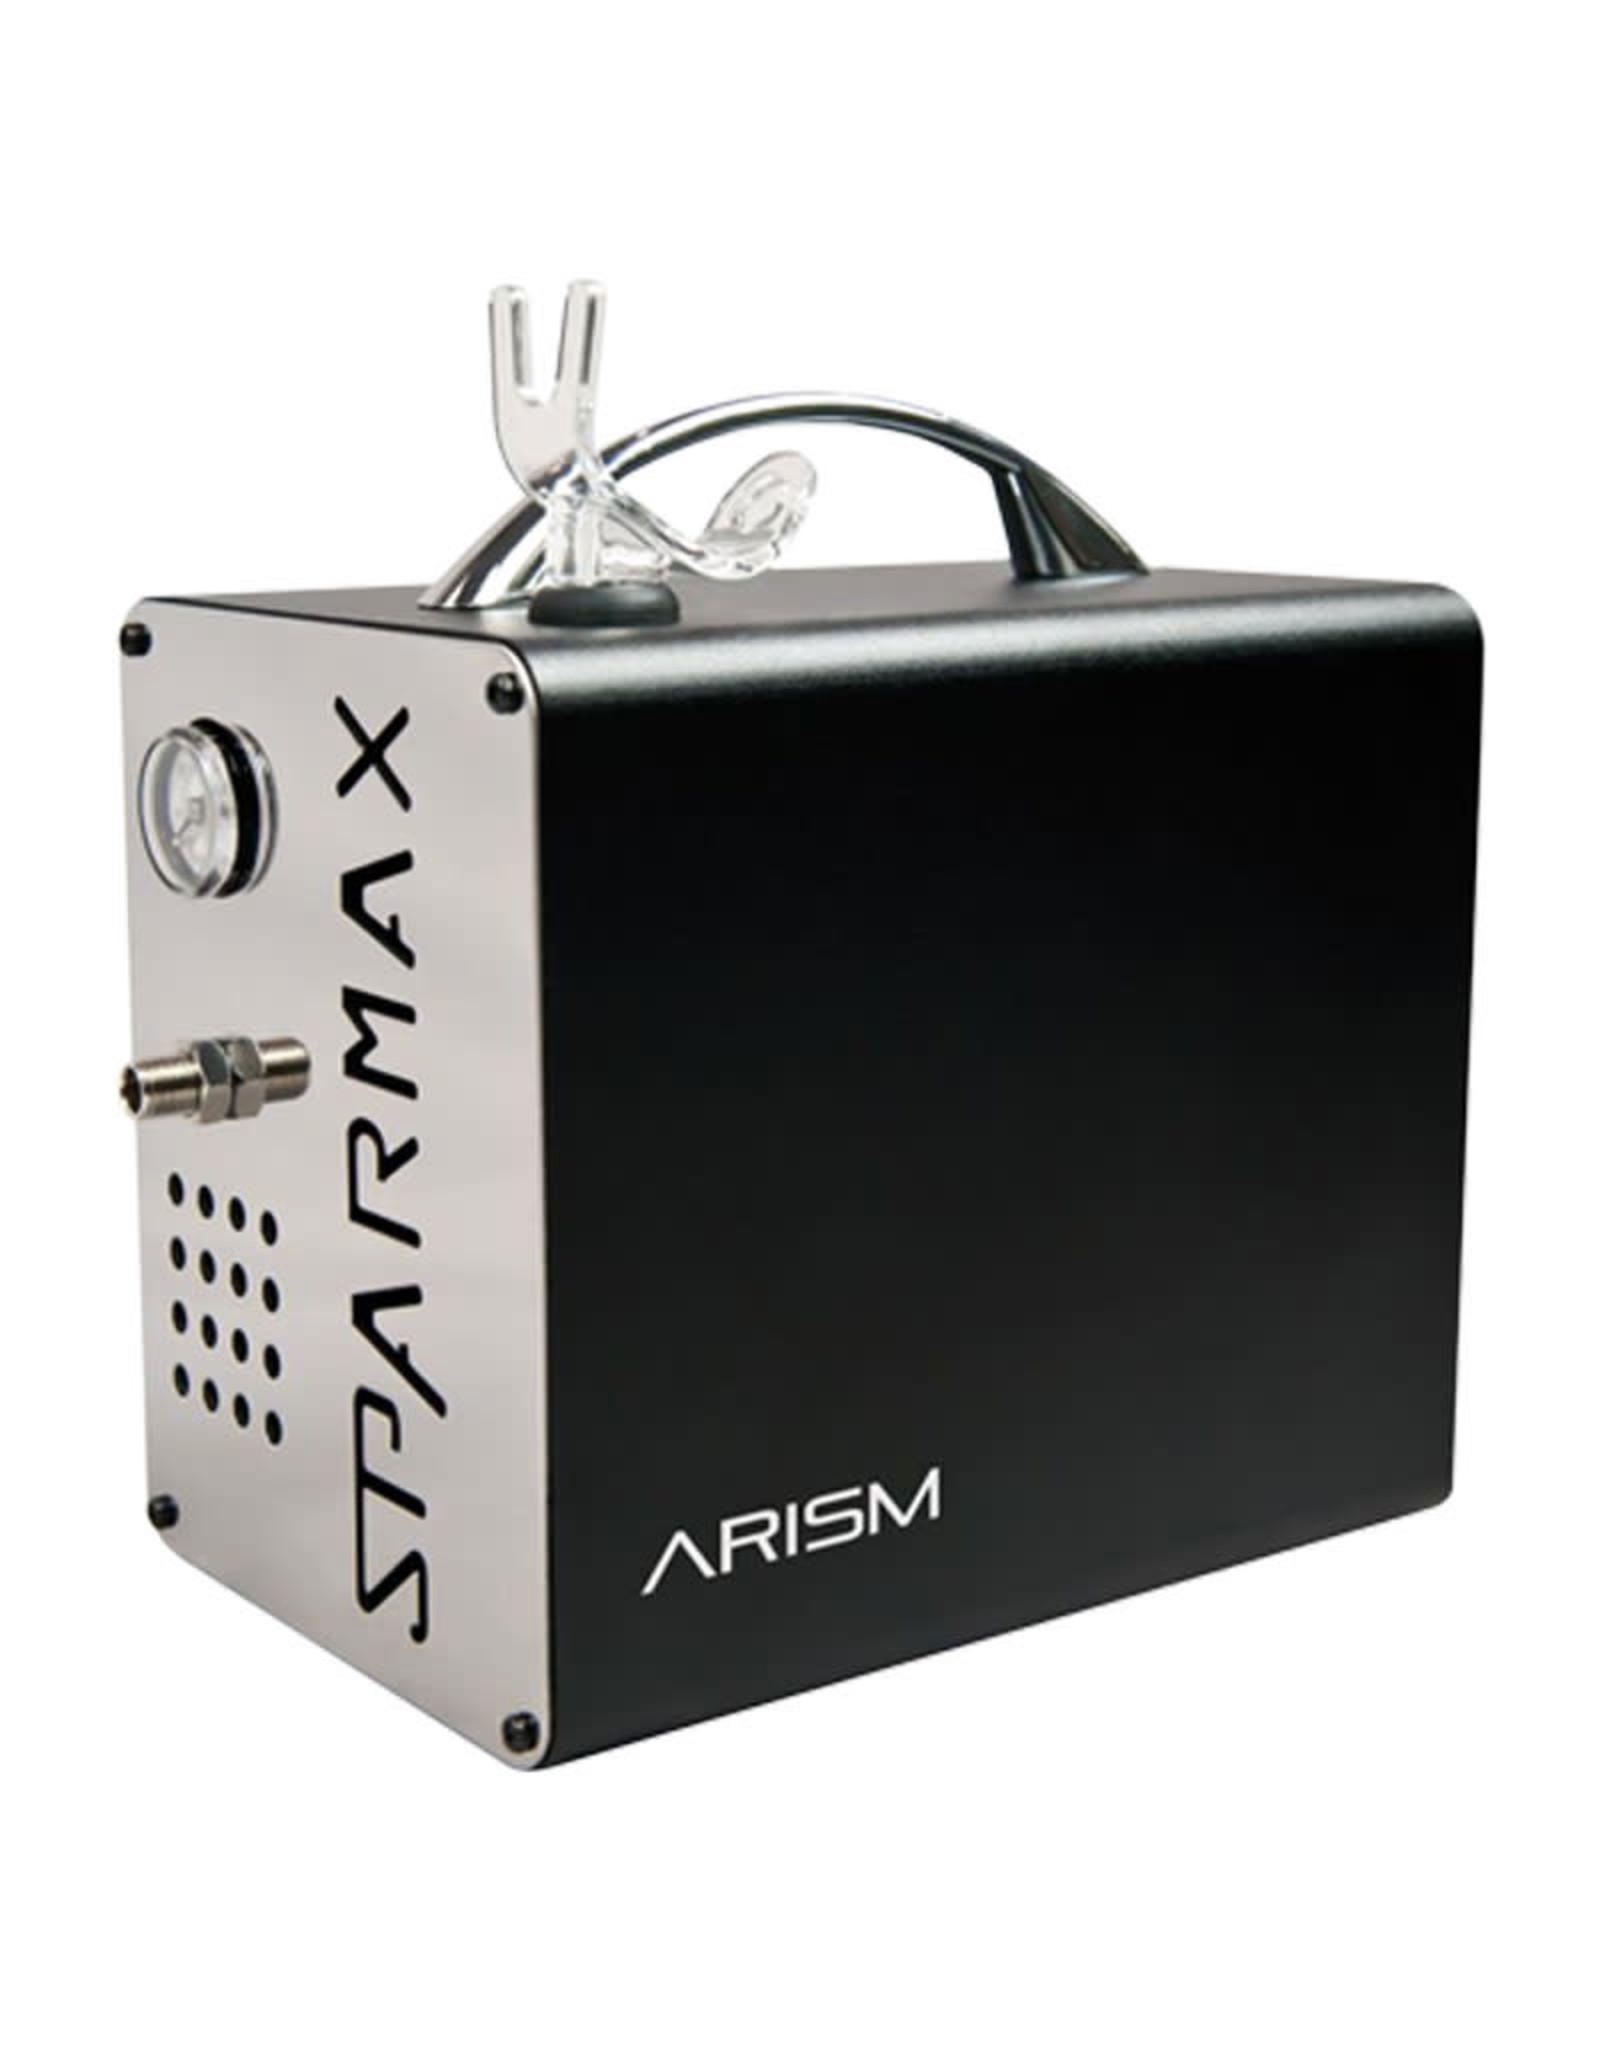 Sparmax Airbrush Sparmax ARISM Compressor